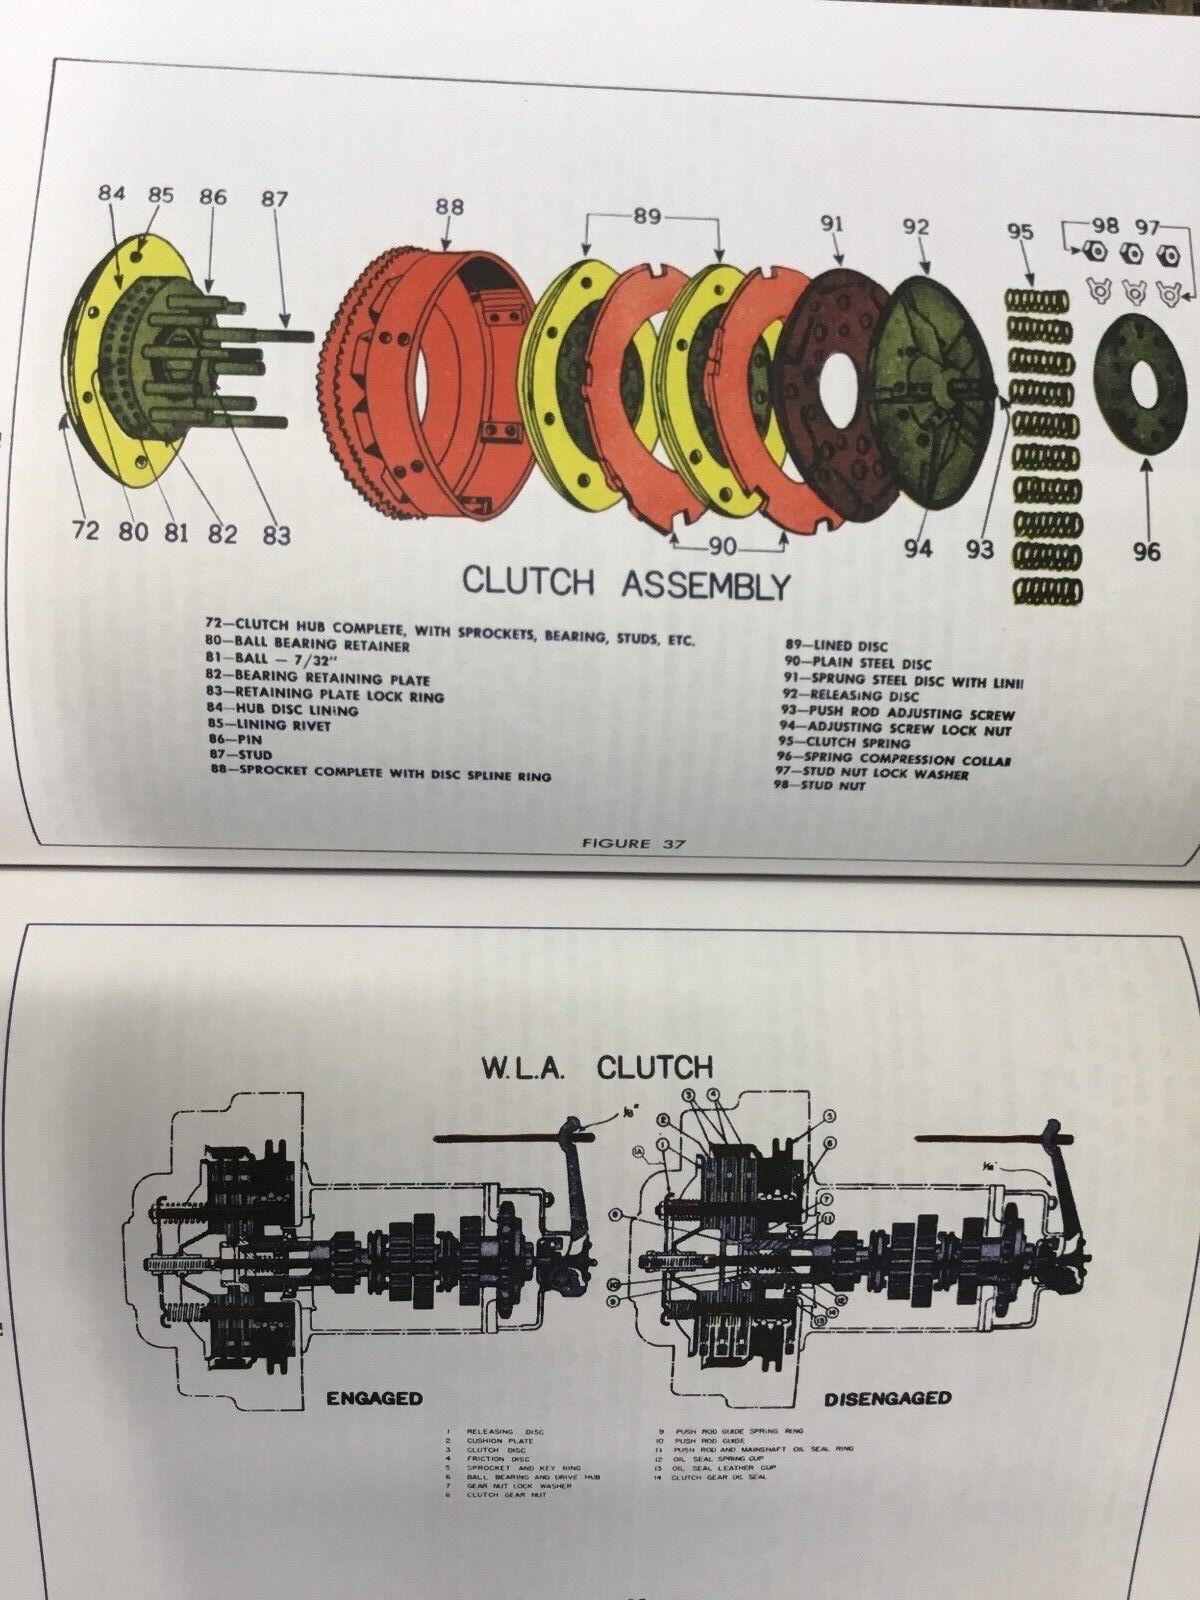 2003 ez go txt wiring diagram how to construct a pourbaix ezgo volt rep forward reverse switch youtube golf cart